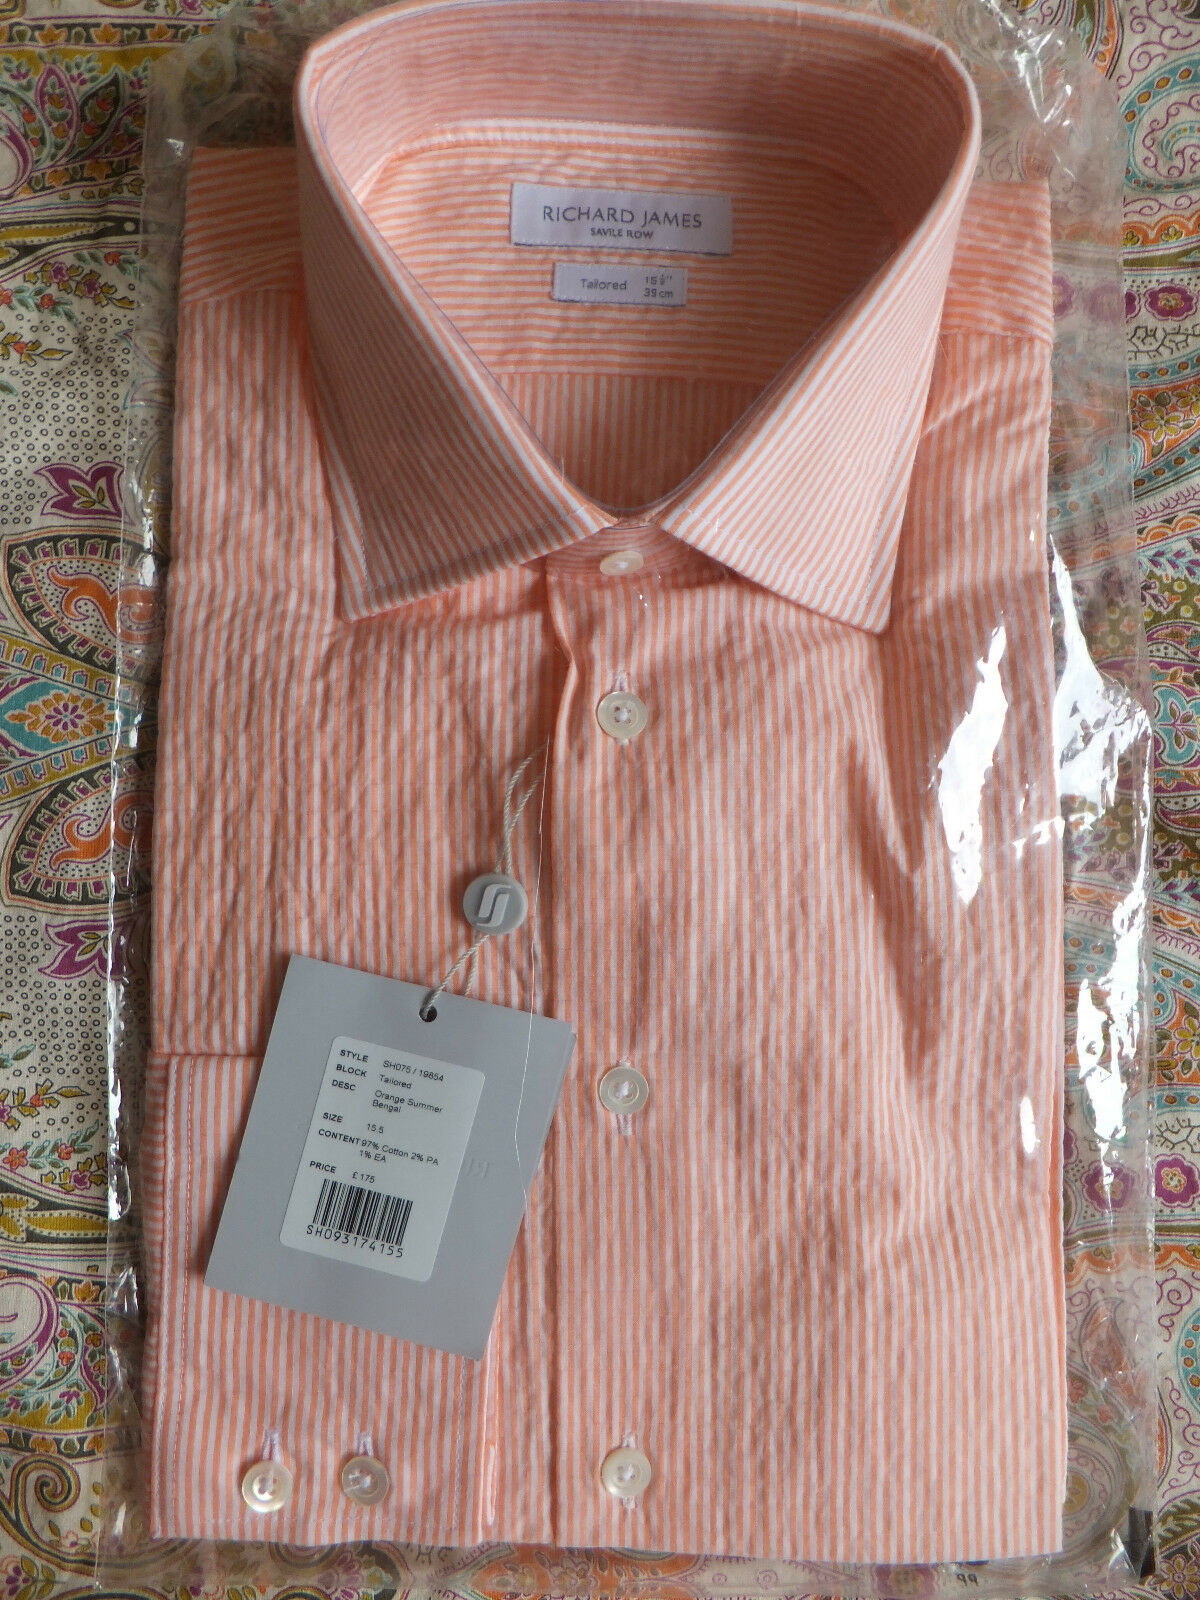 Richard James Savile Row Shirt TailoROT Fit Collar 15.5 Brand New